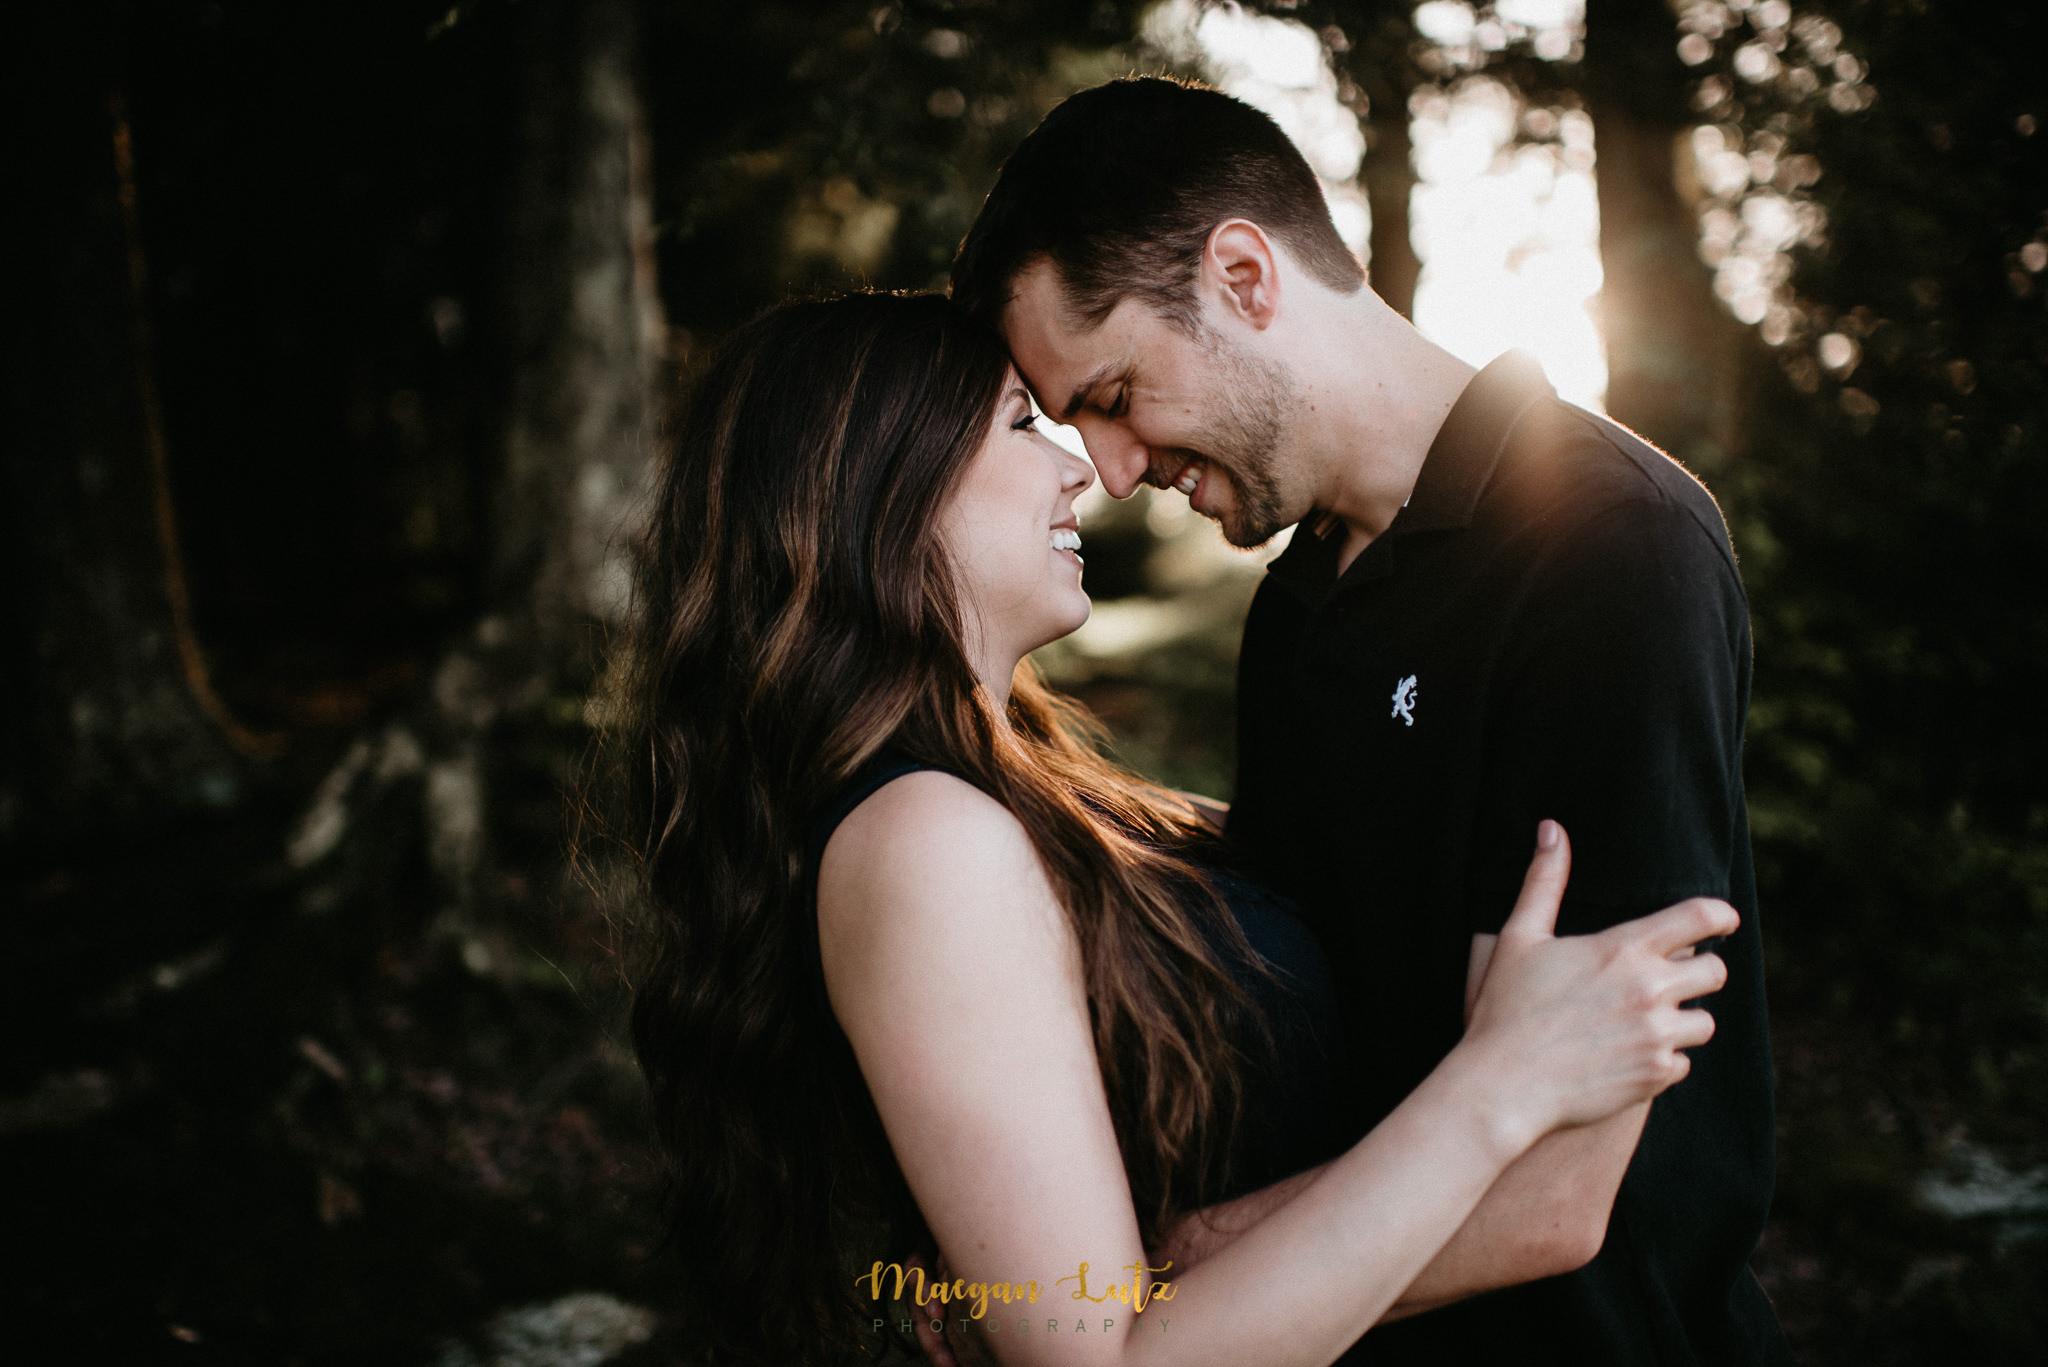 NEPA-Engagement-Wedding-Photographer-Session-at-Ricketts-Glen-State-Park-32.jpg